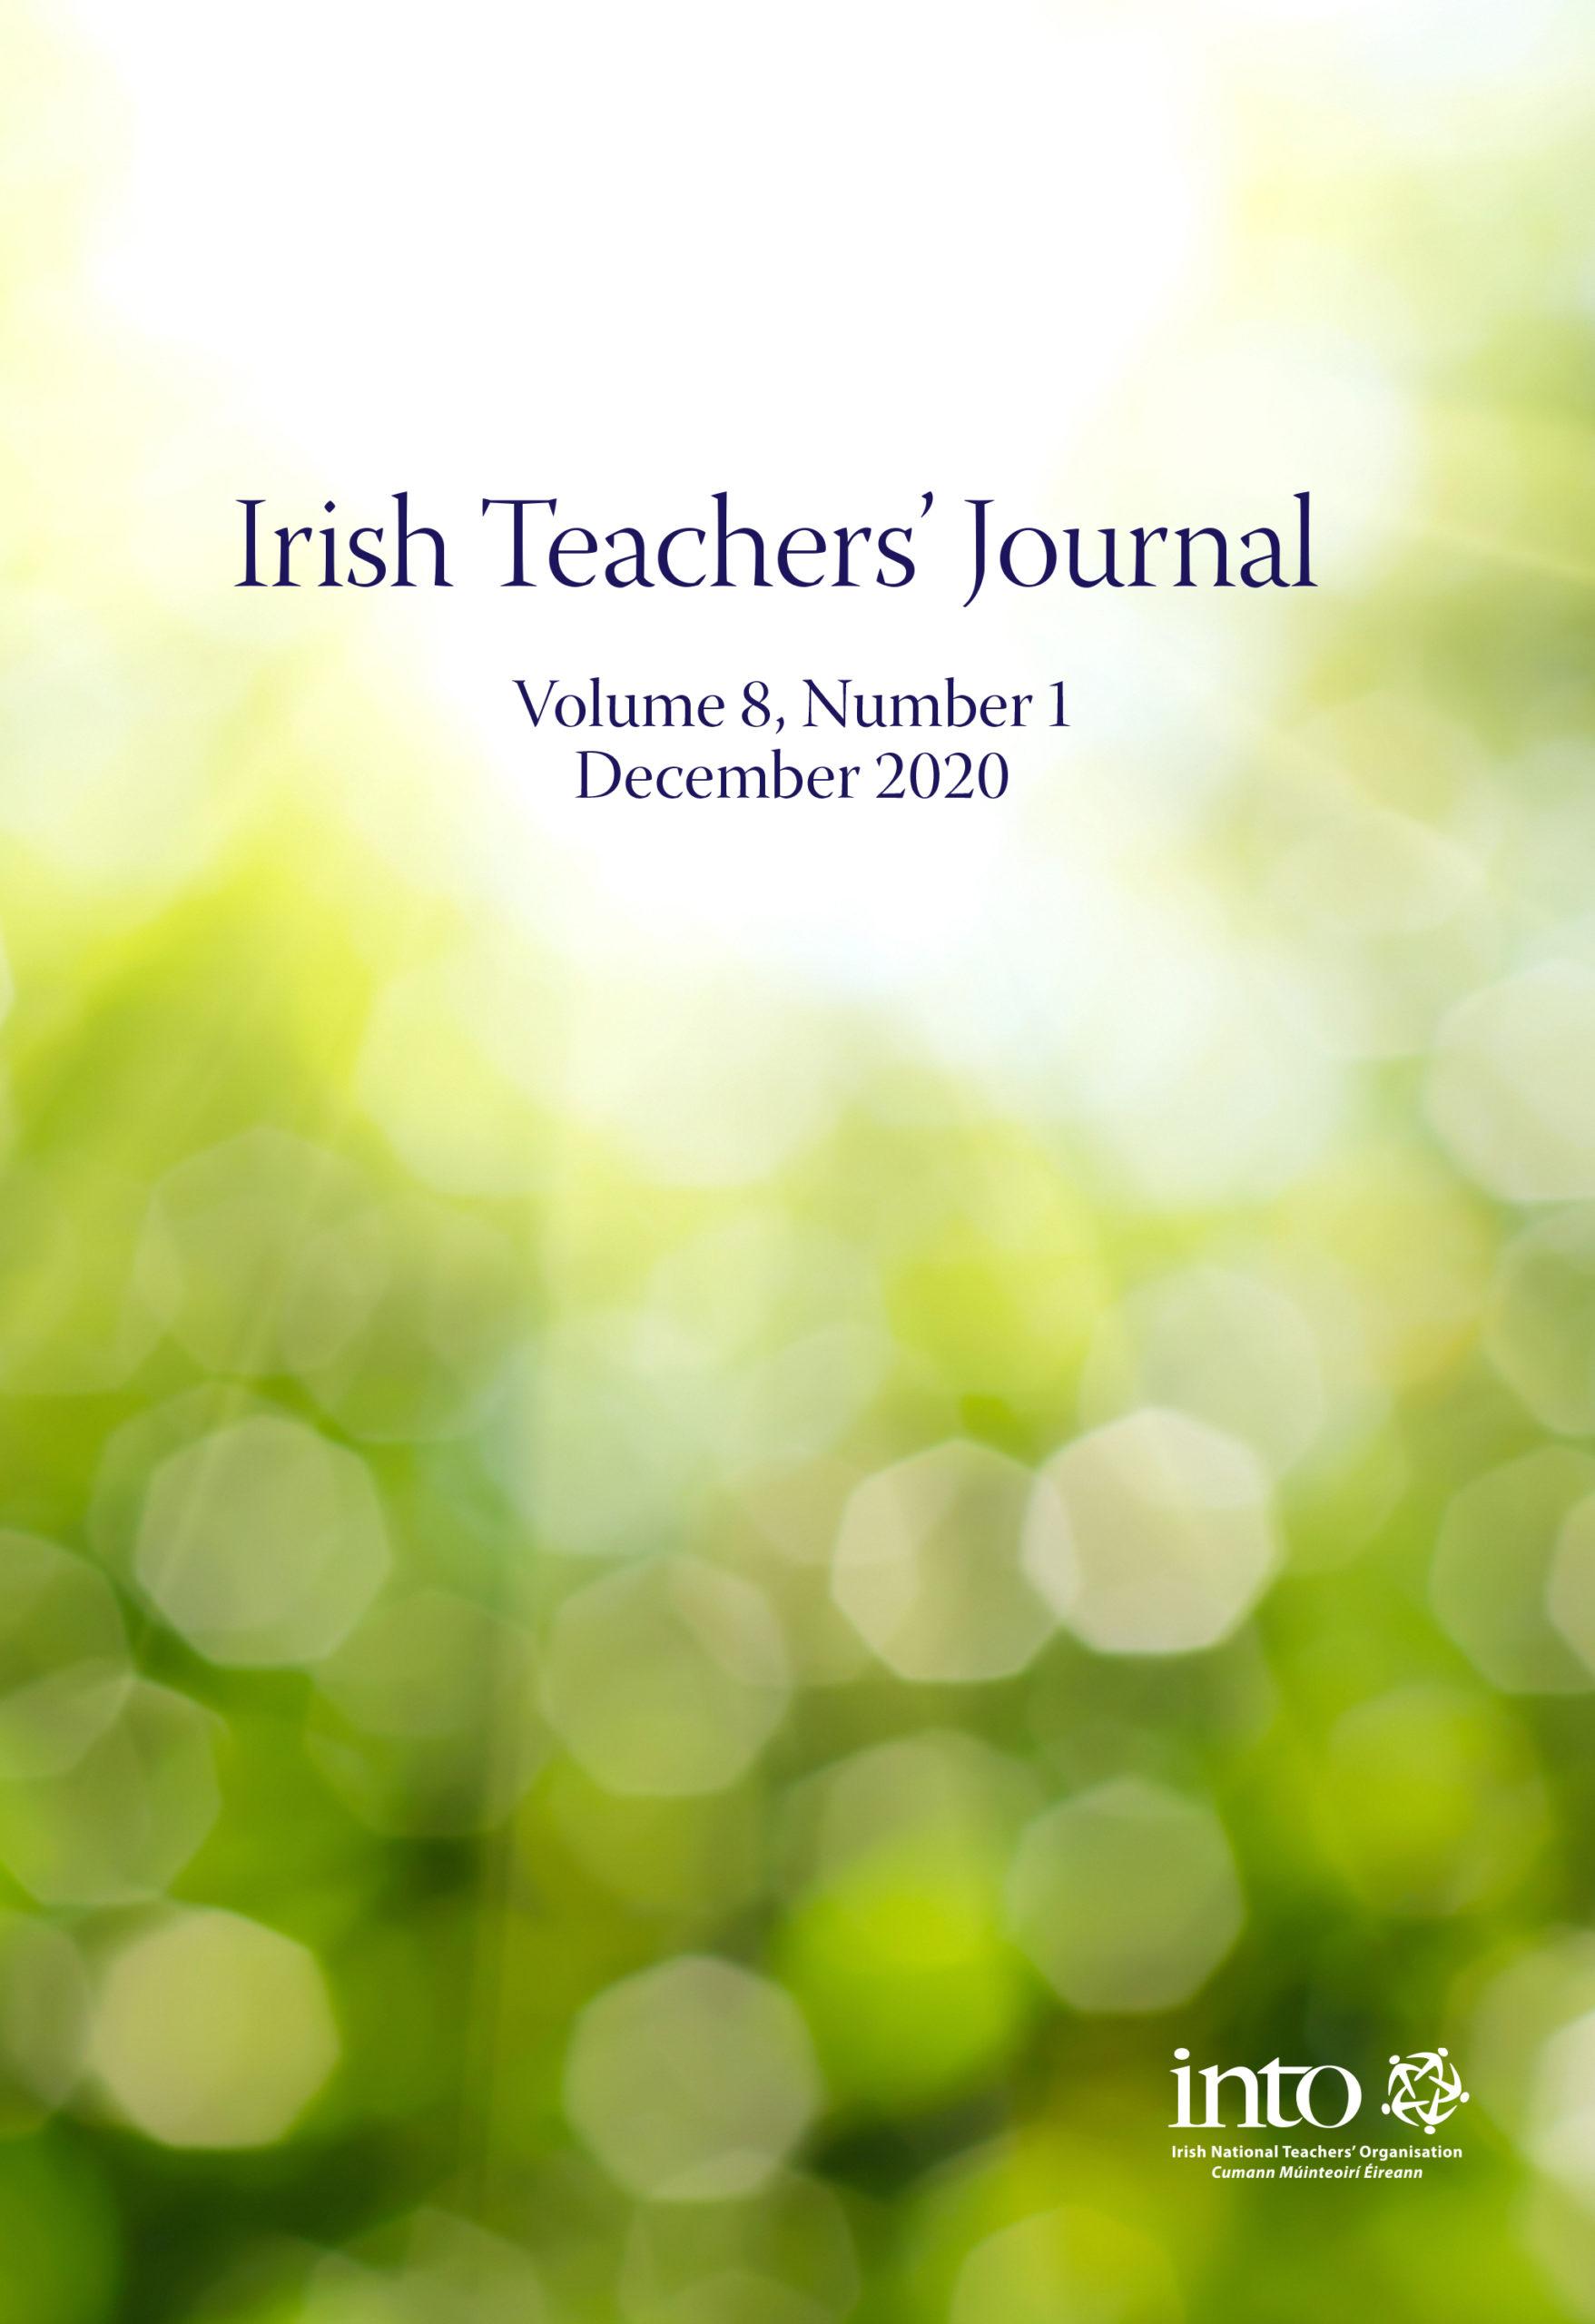 Irish Teachers' Journal 2020 Vol 8